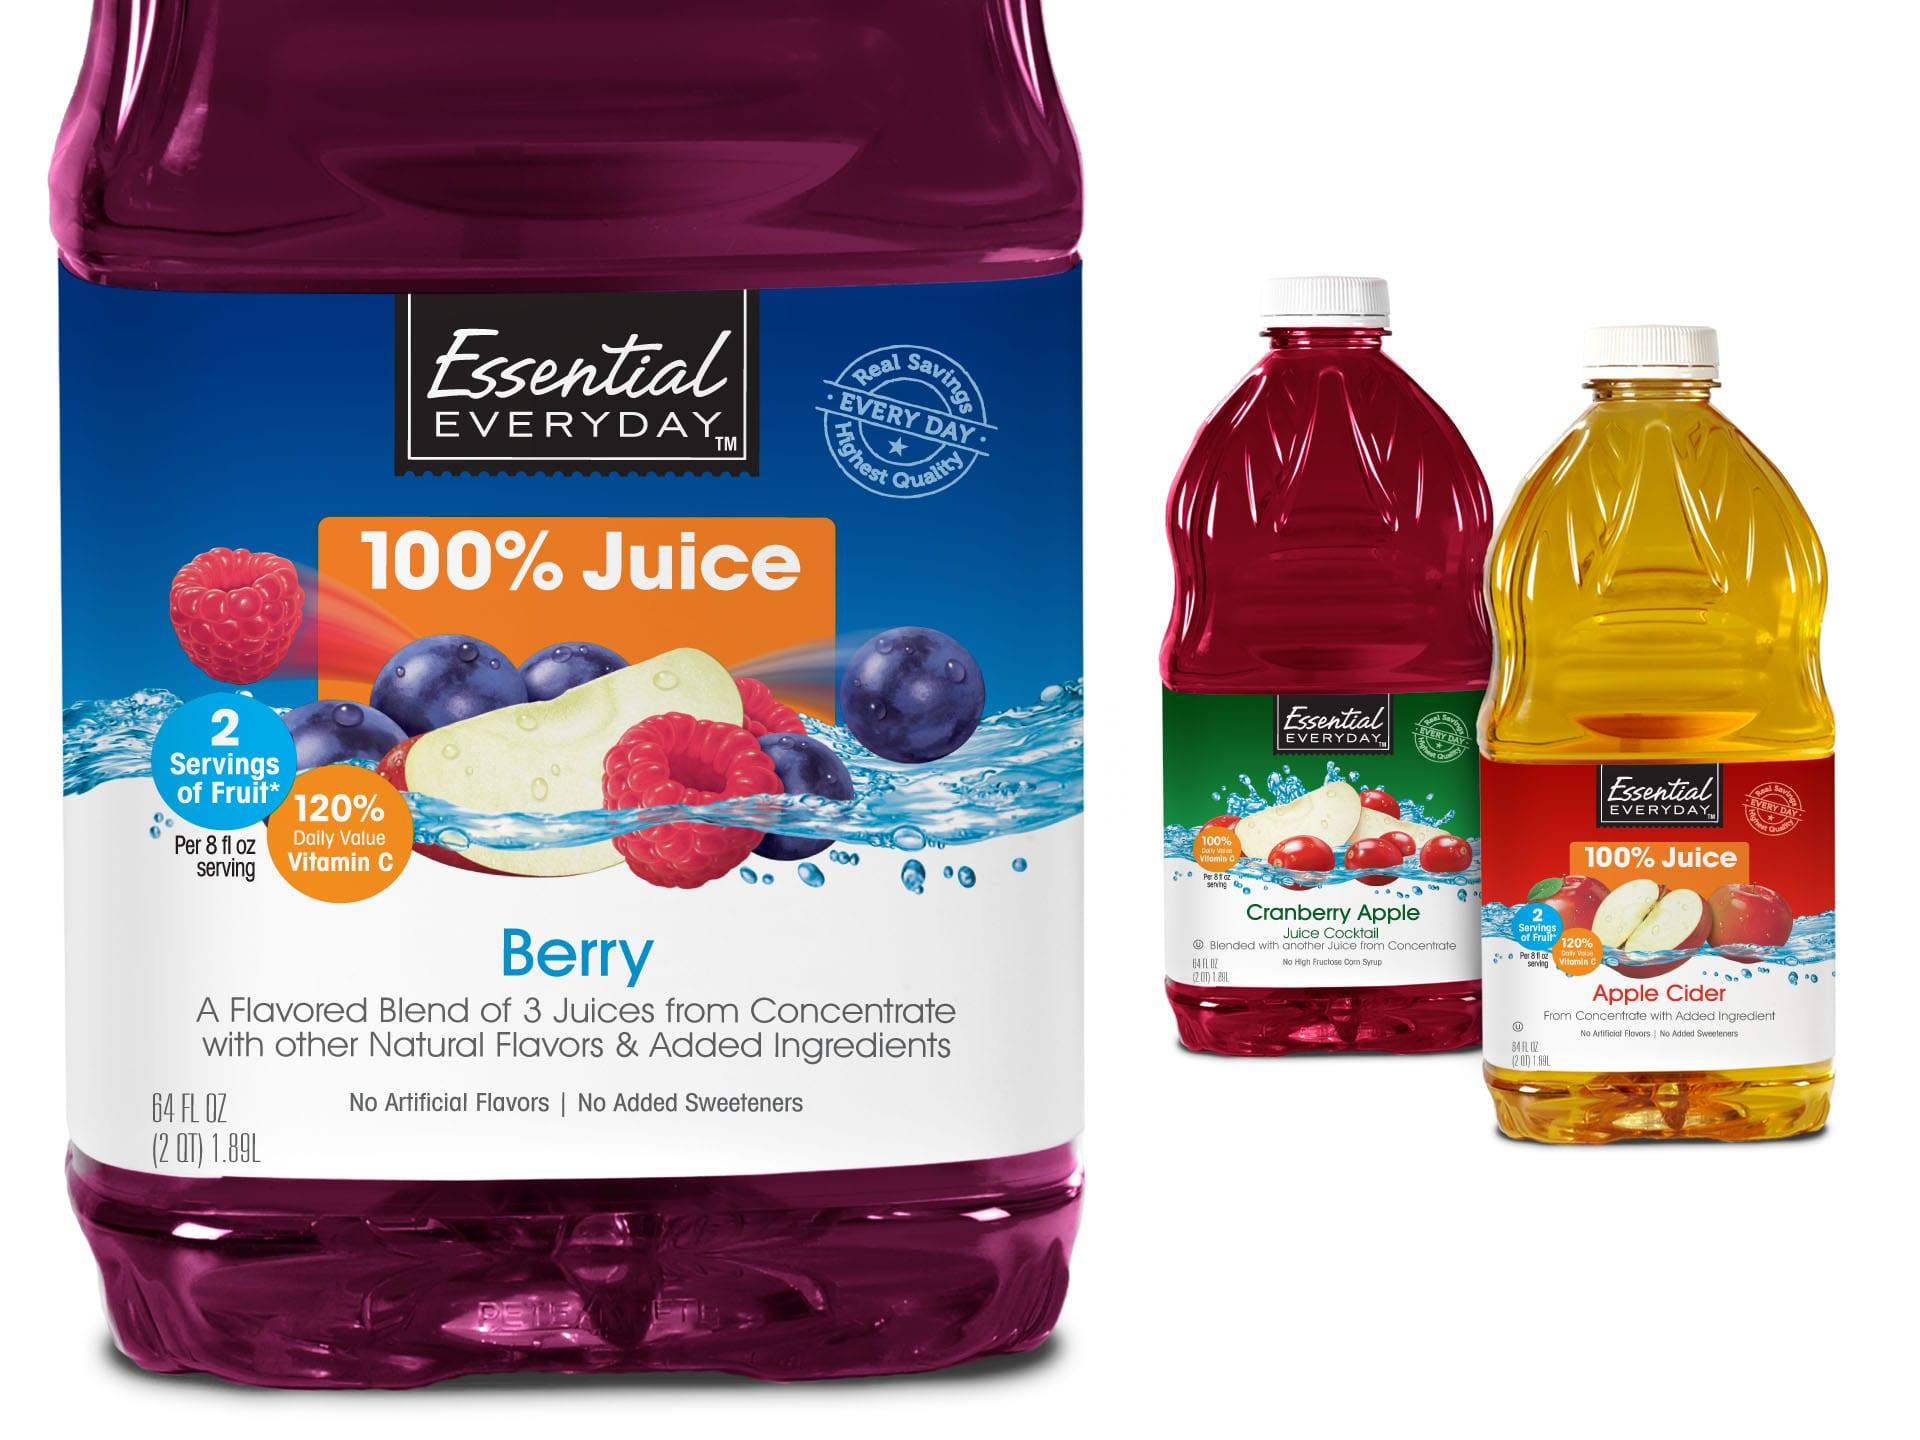 Essential Everyday Juice